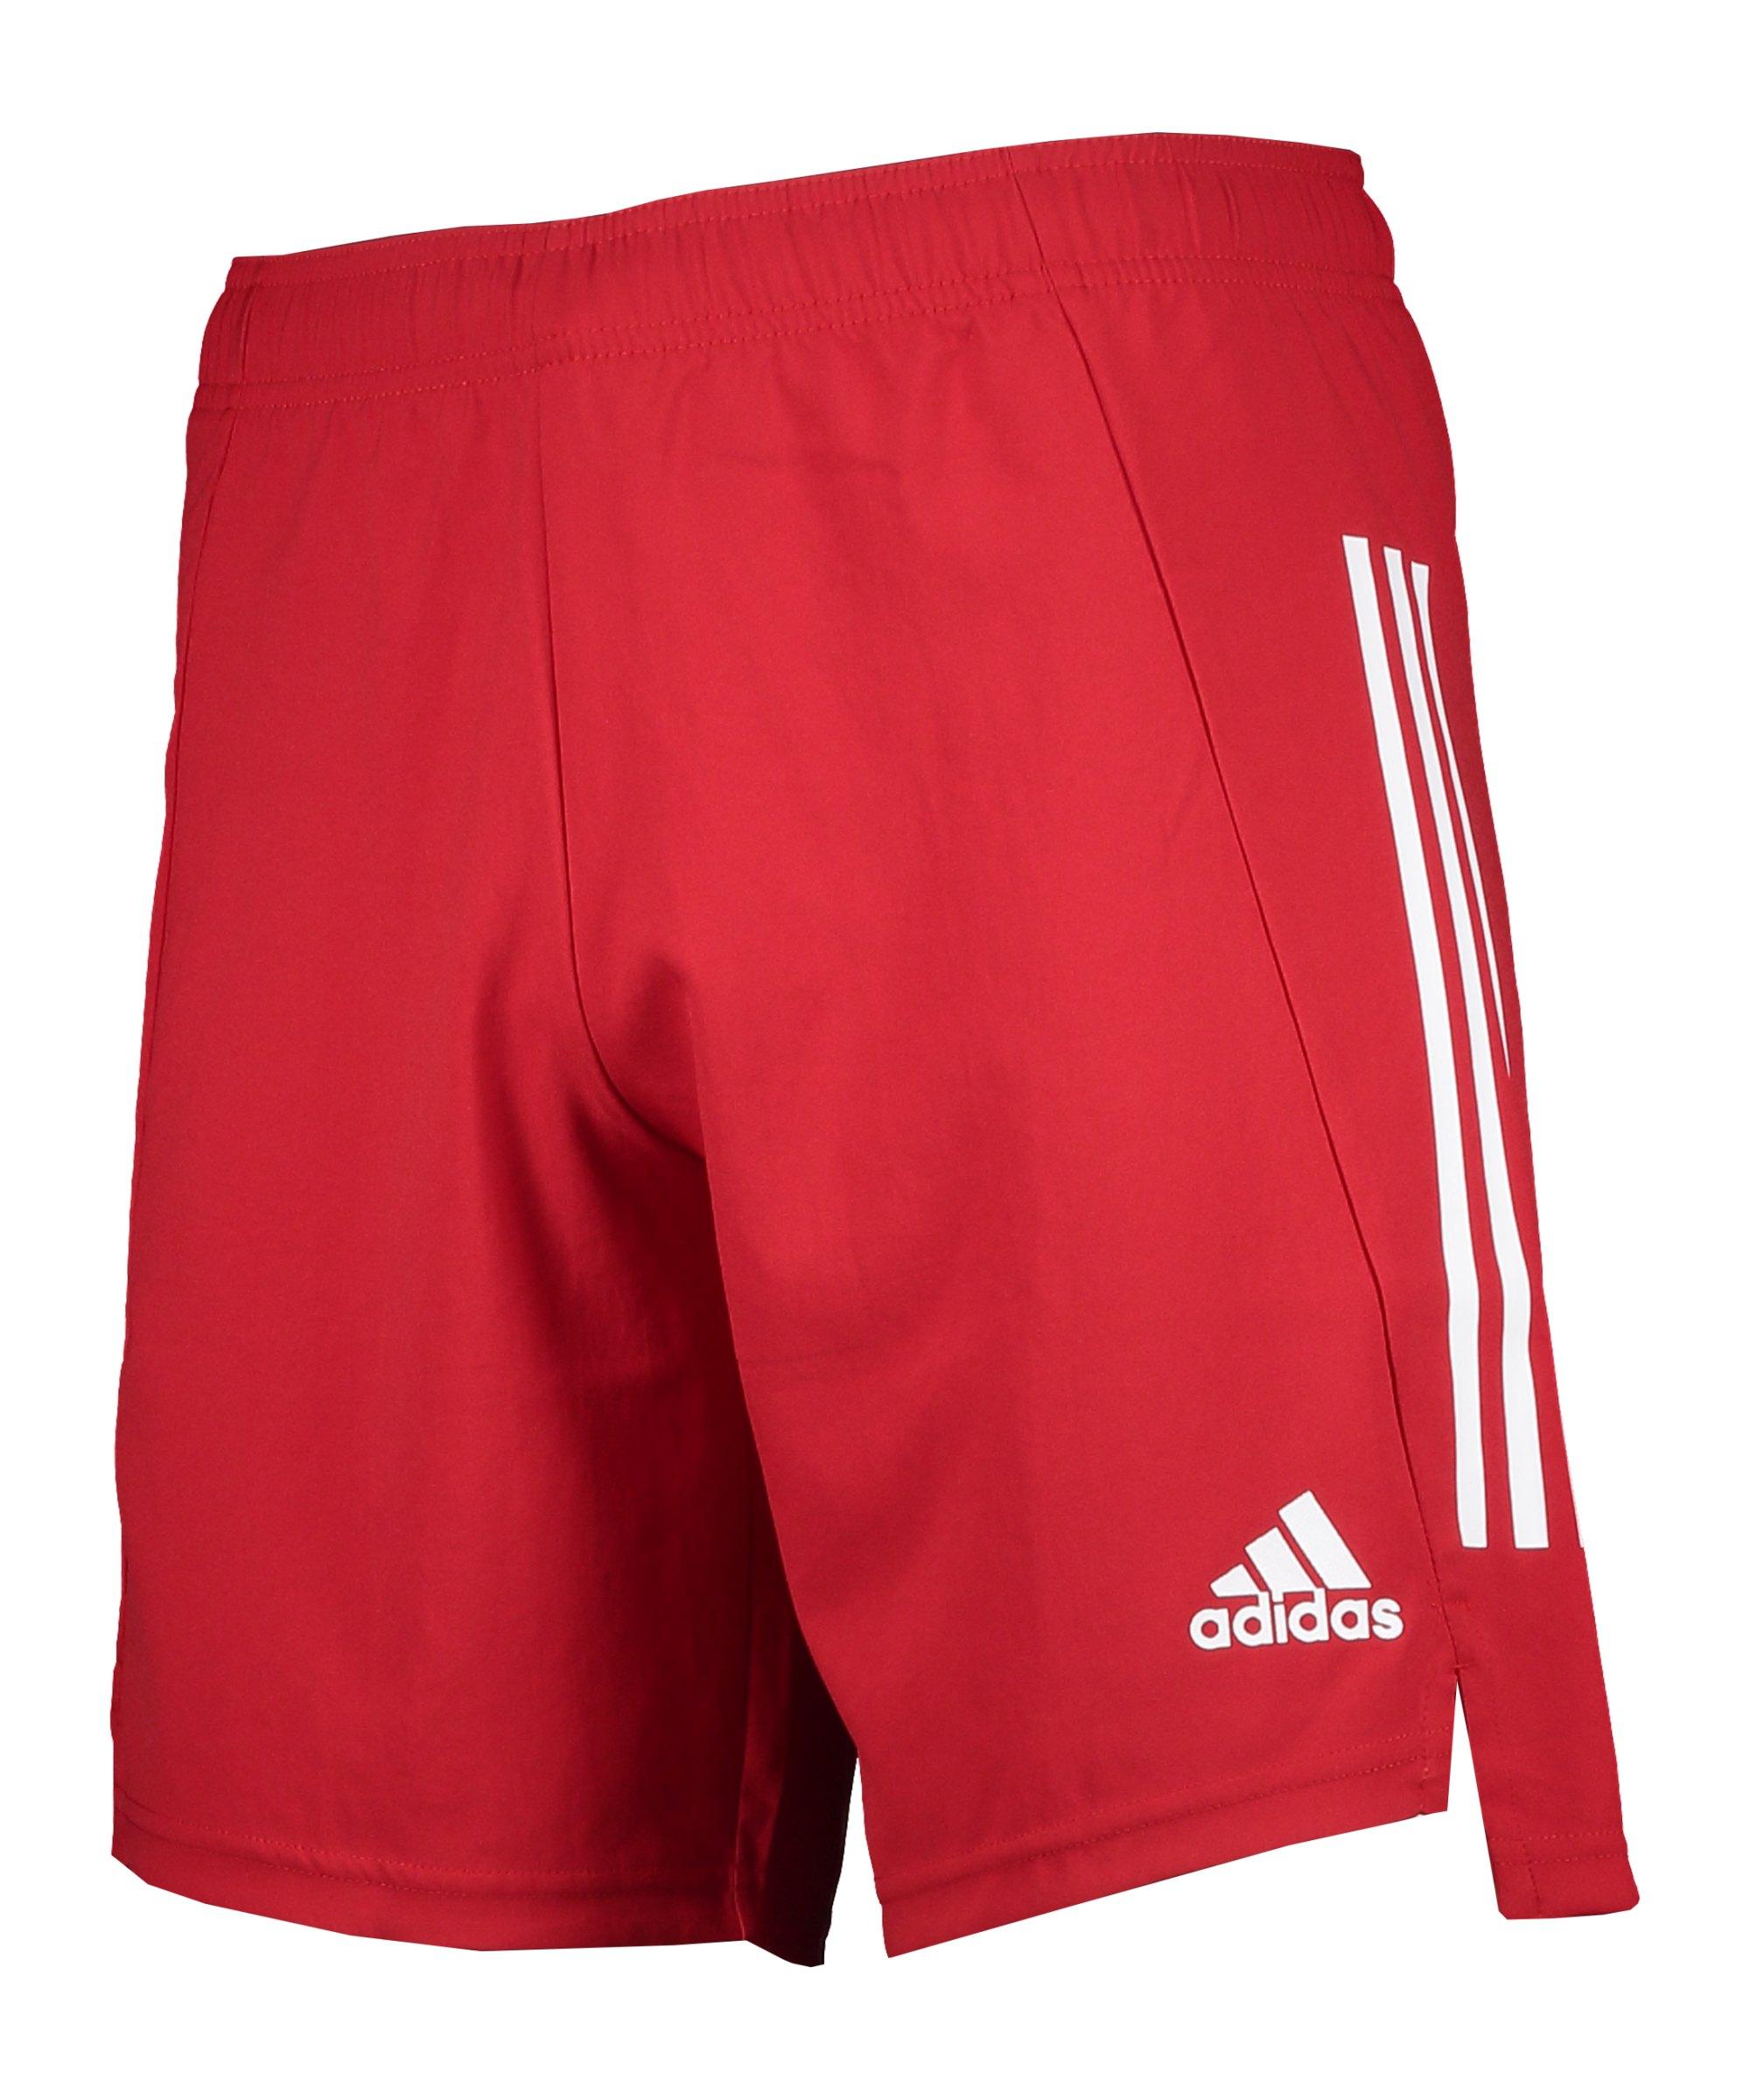 adidas Condivo 21 Short Rot Weiss - rot